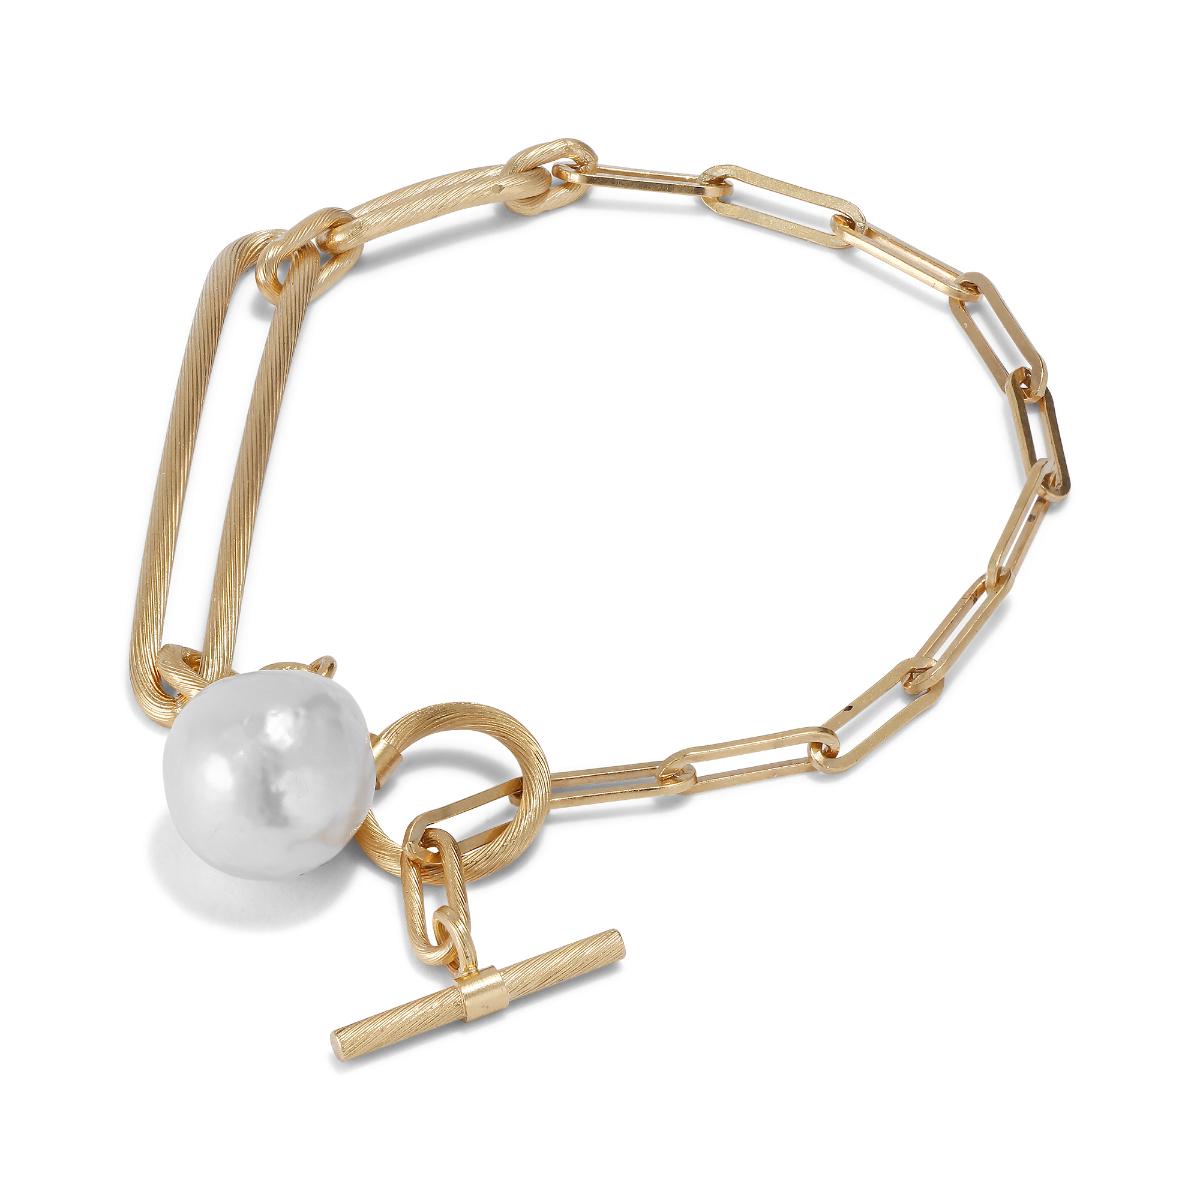 Jane Kønig Salon Pearl armbånd, guld, medium